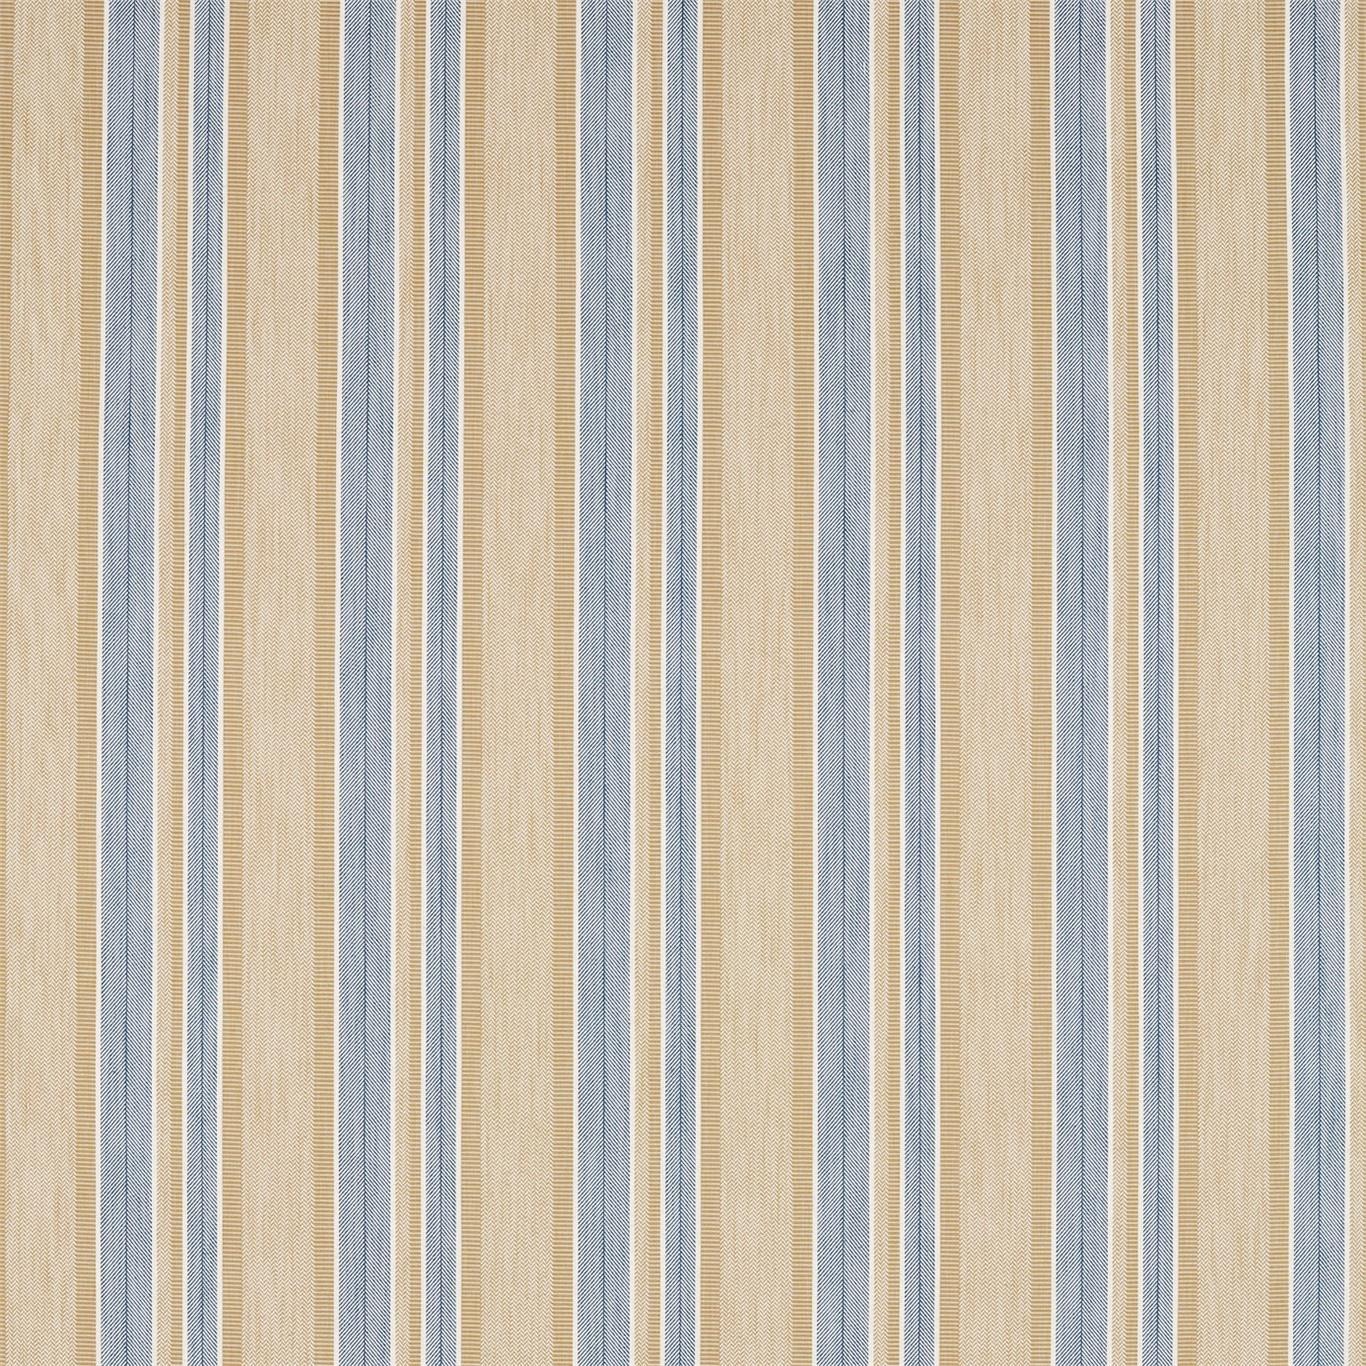 Image of Sanderson Home Alcott Denim/Barley Fabric 236417